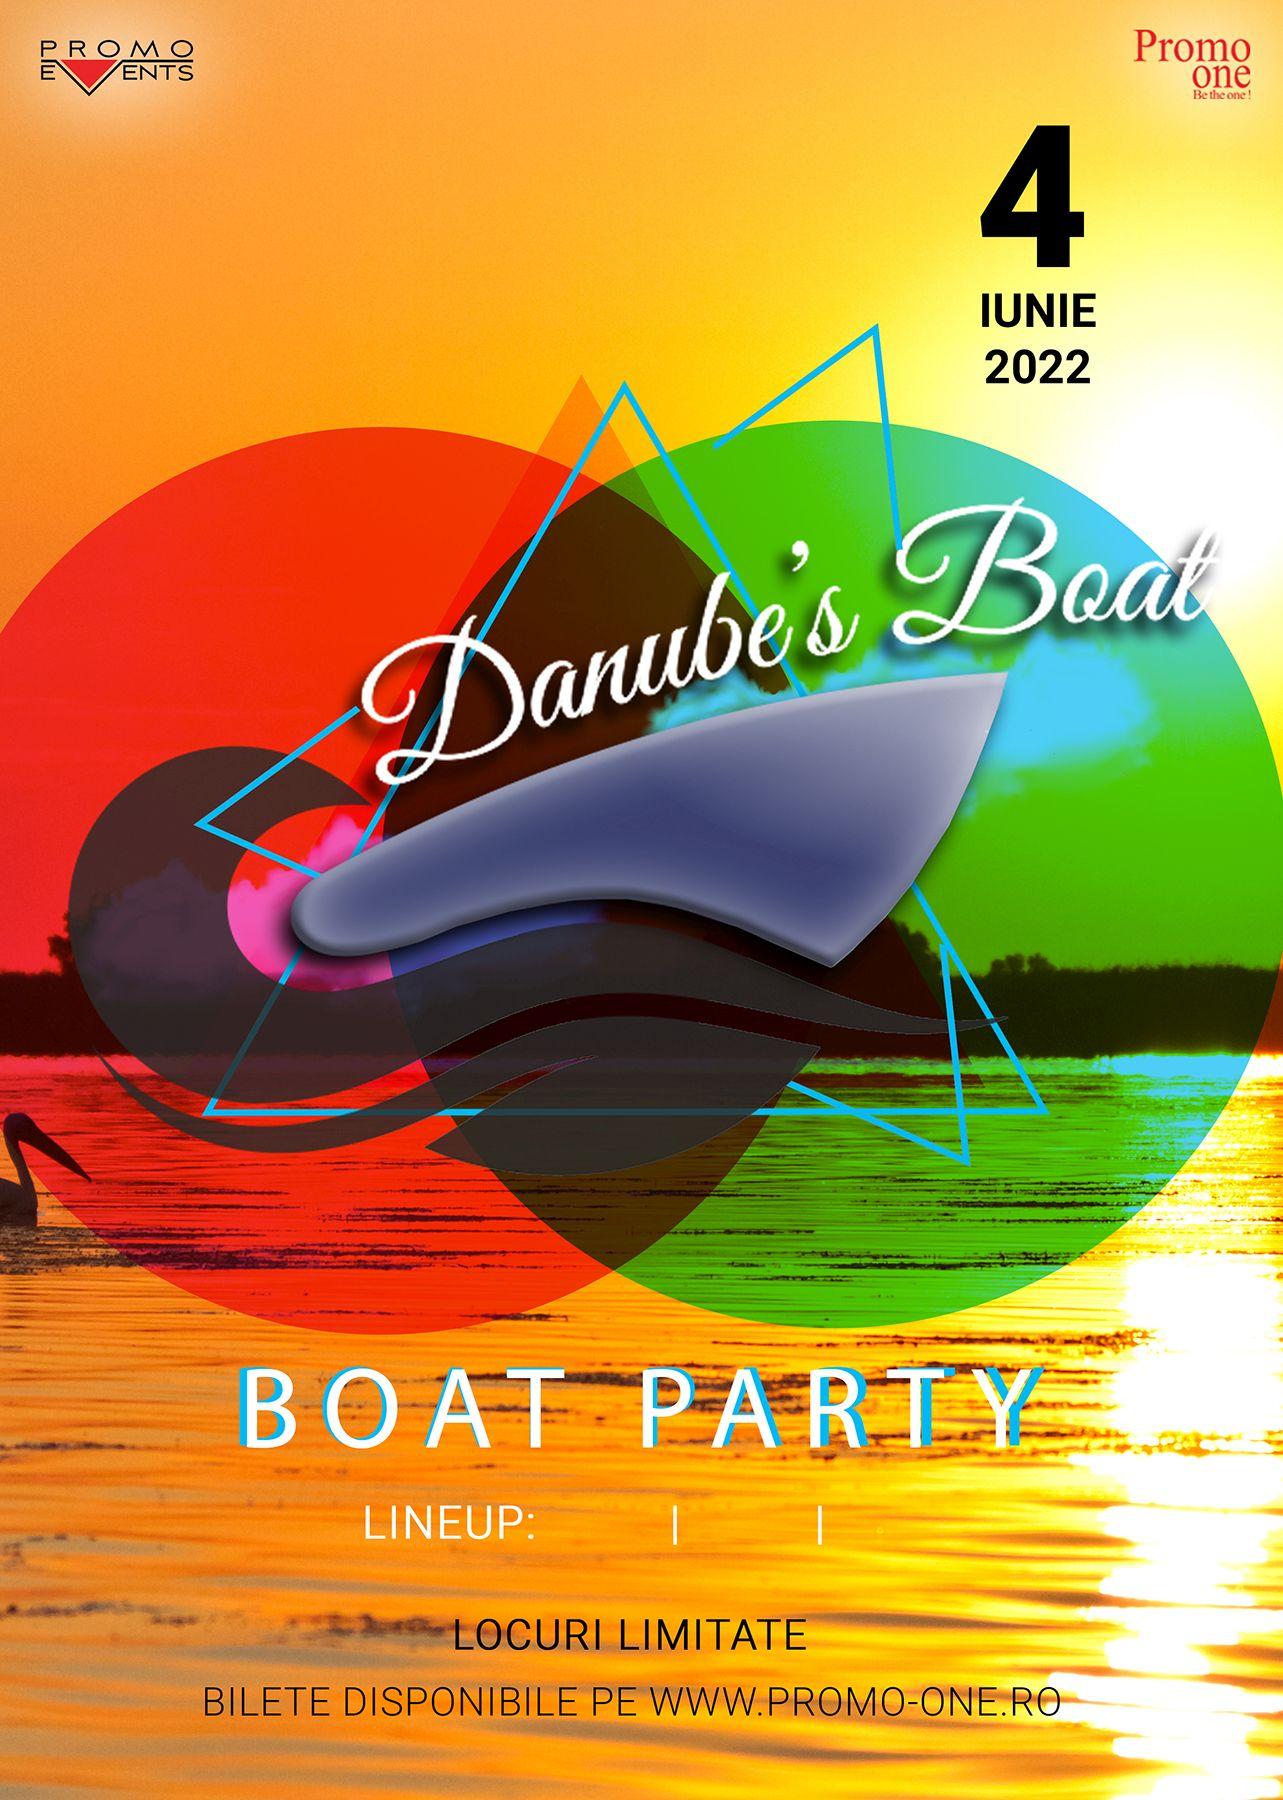 Danube's Boat – 4 iunie 2022